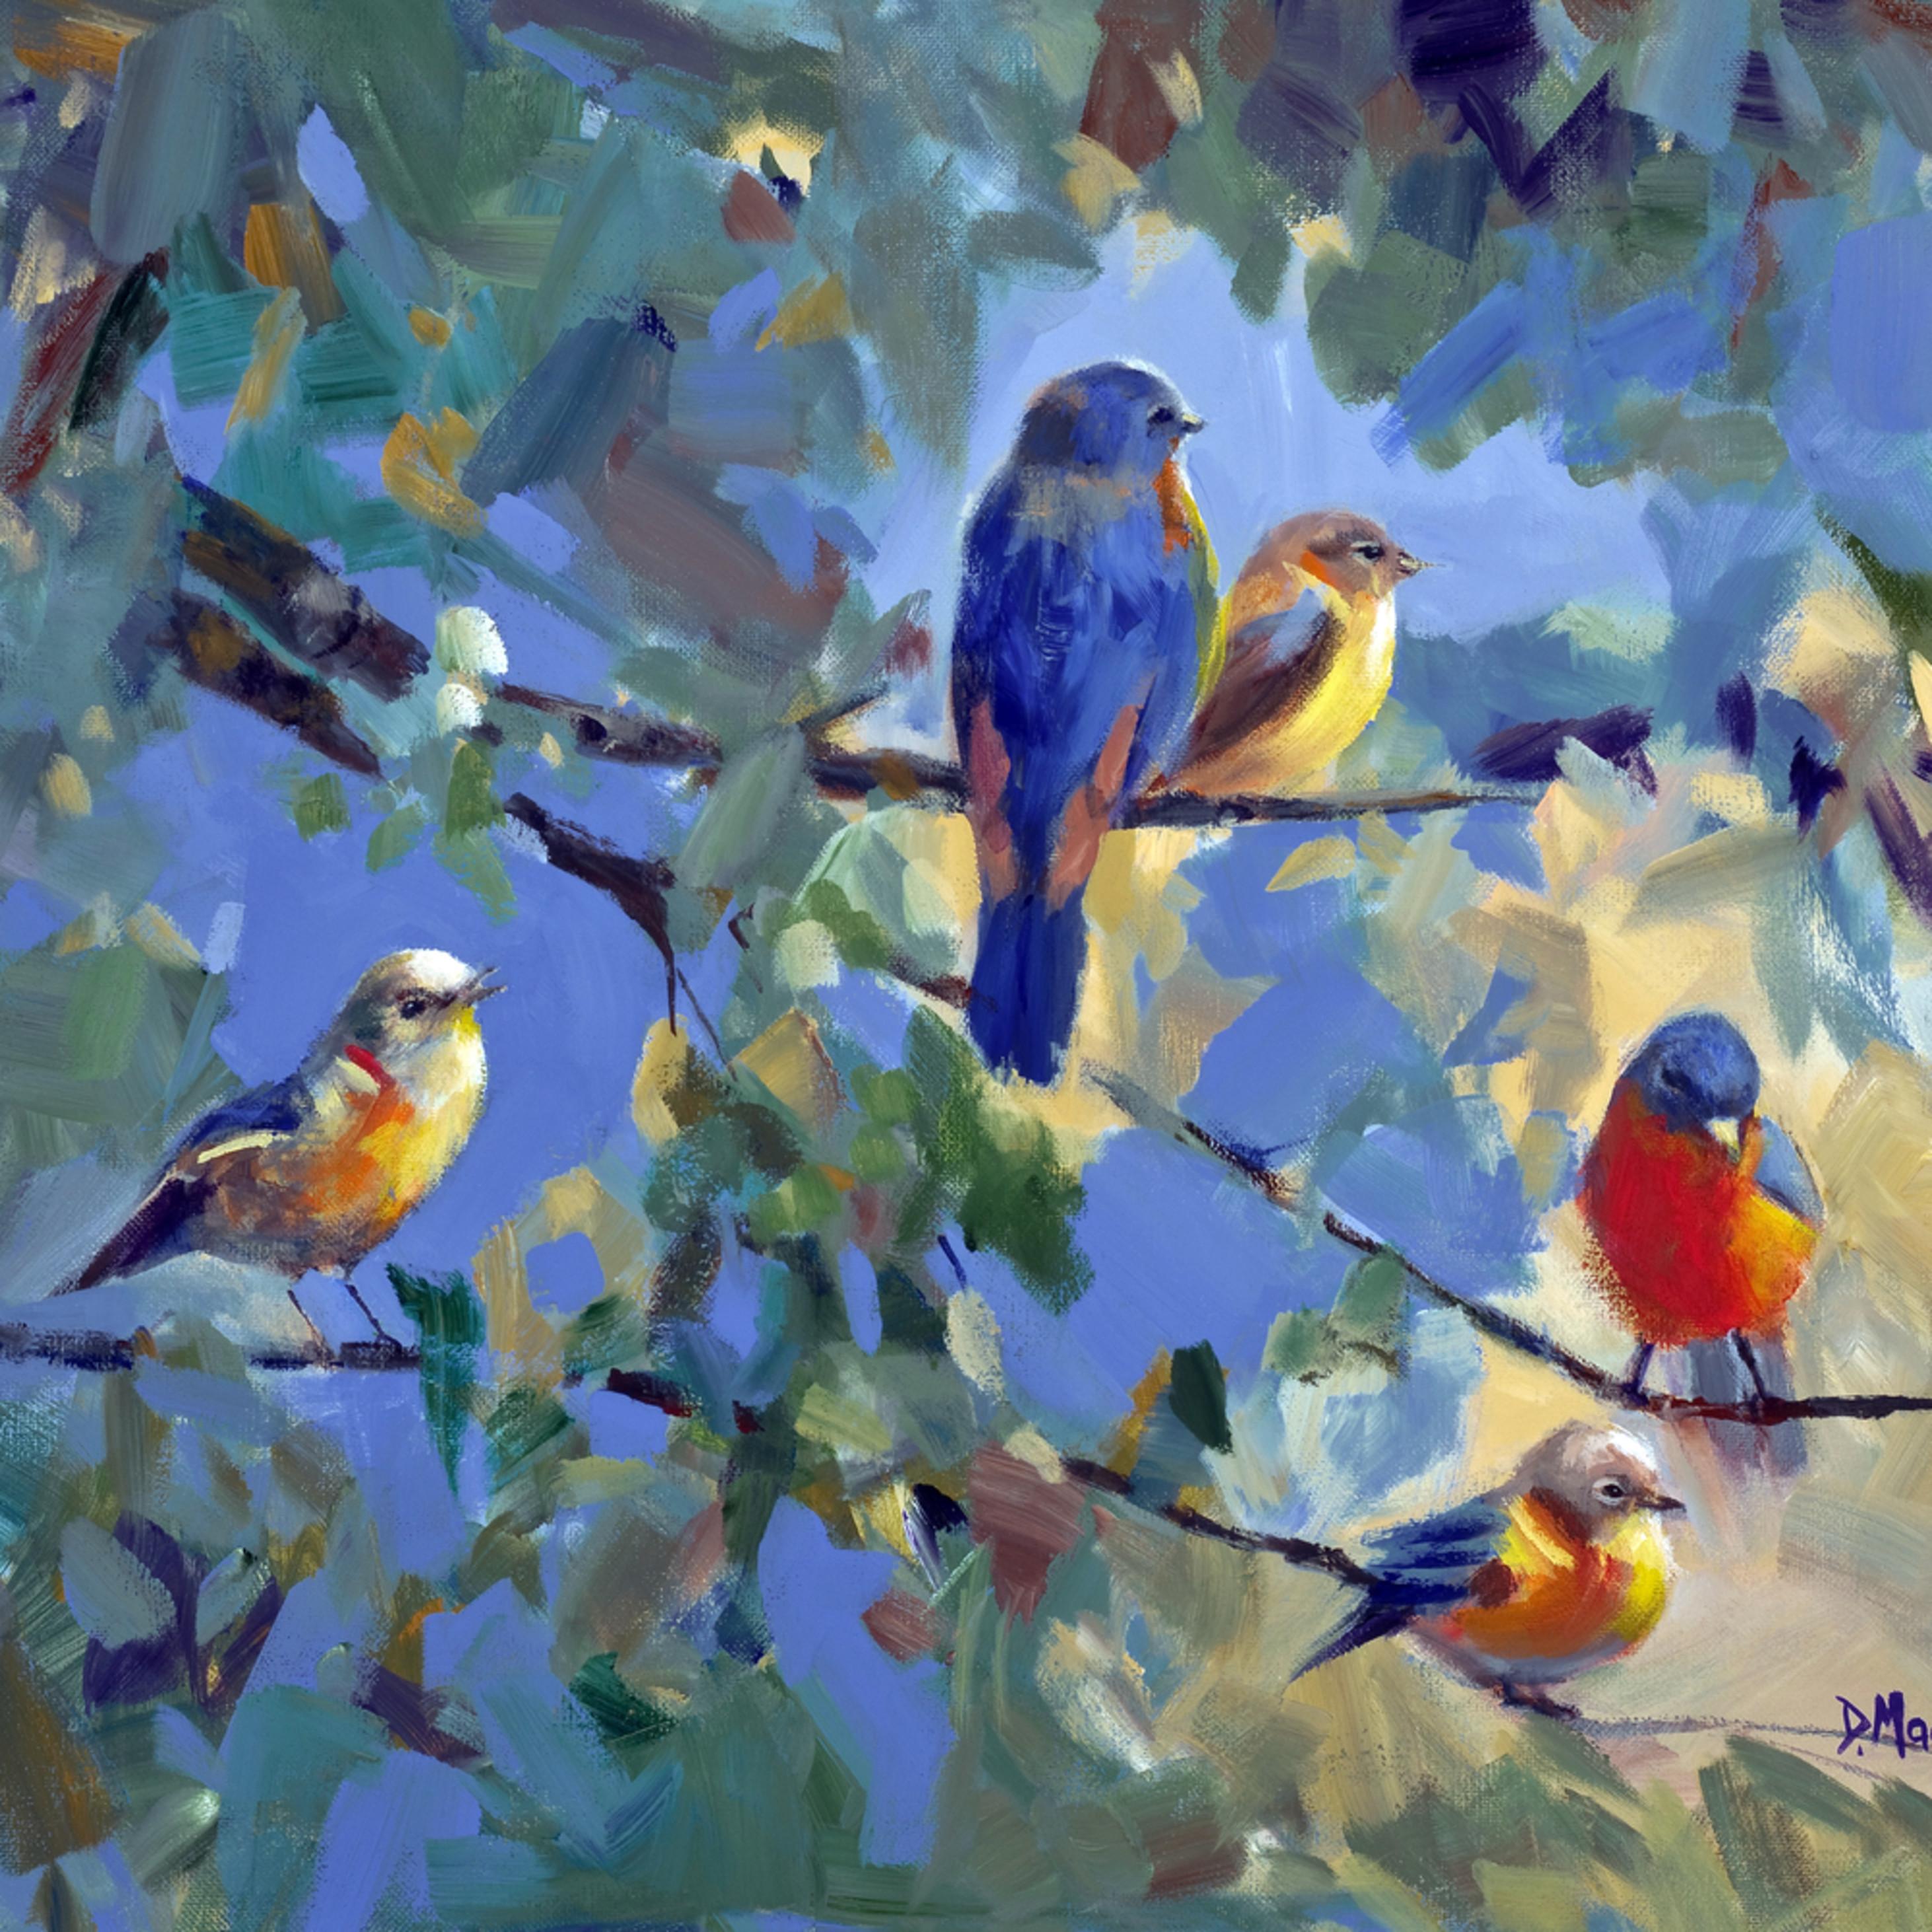 Five birds xxan ft4myx